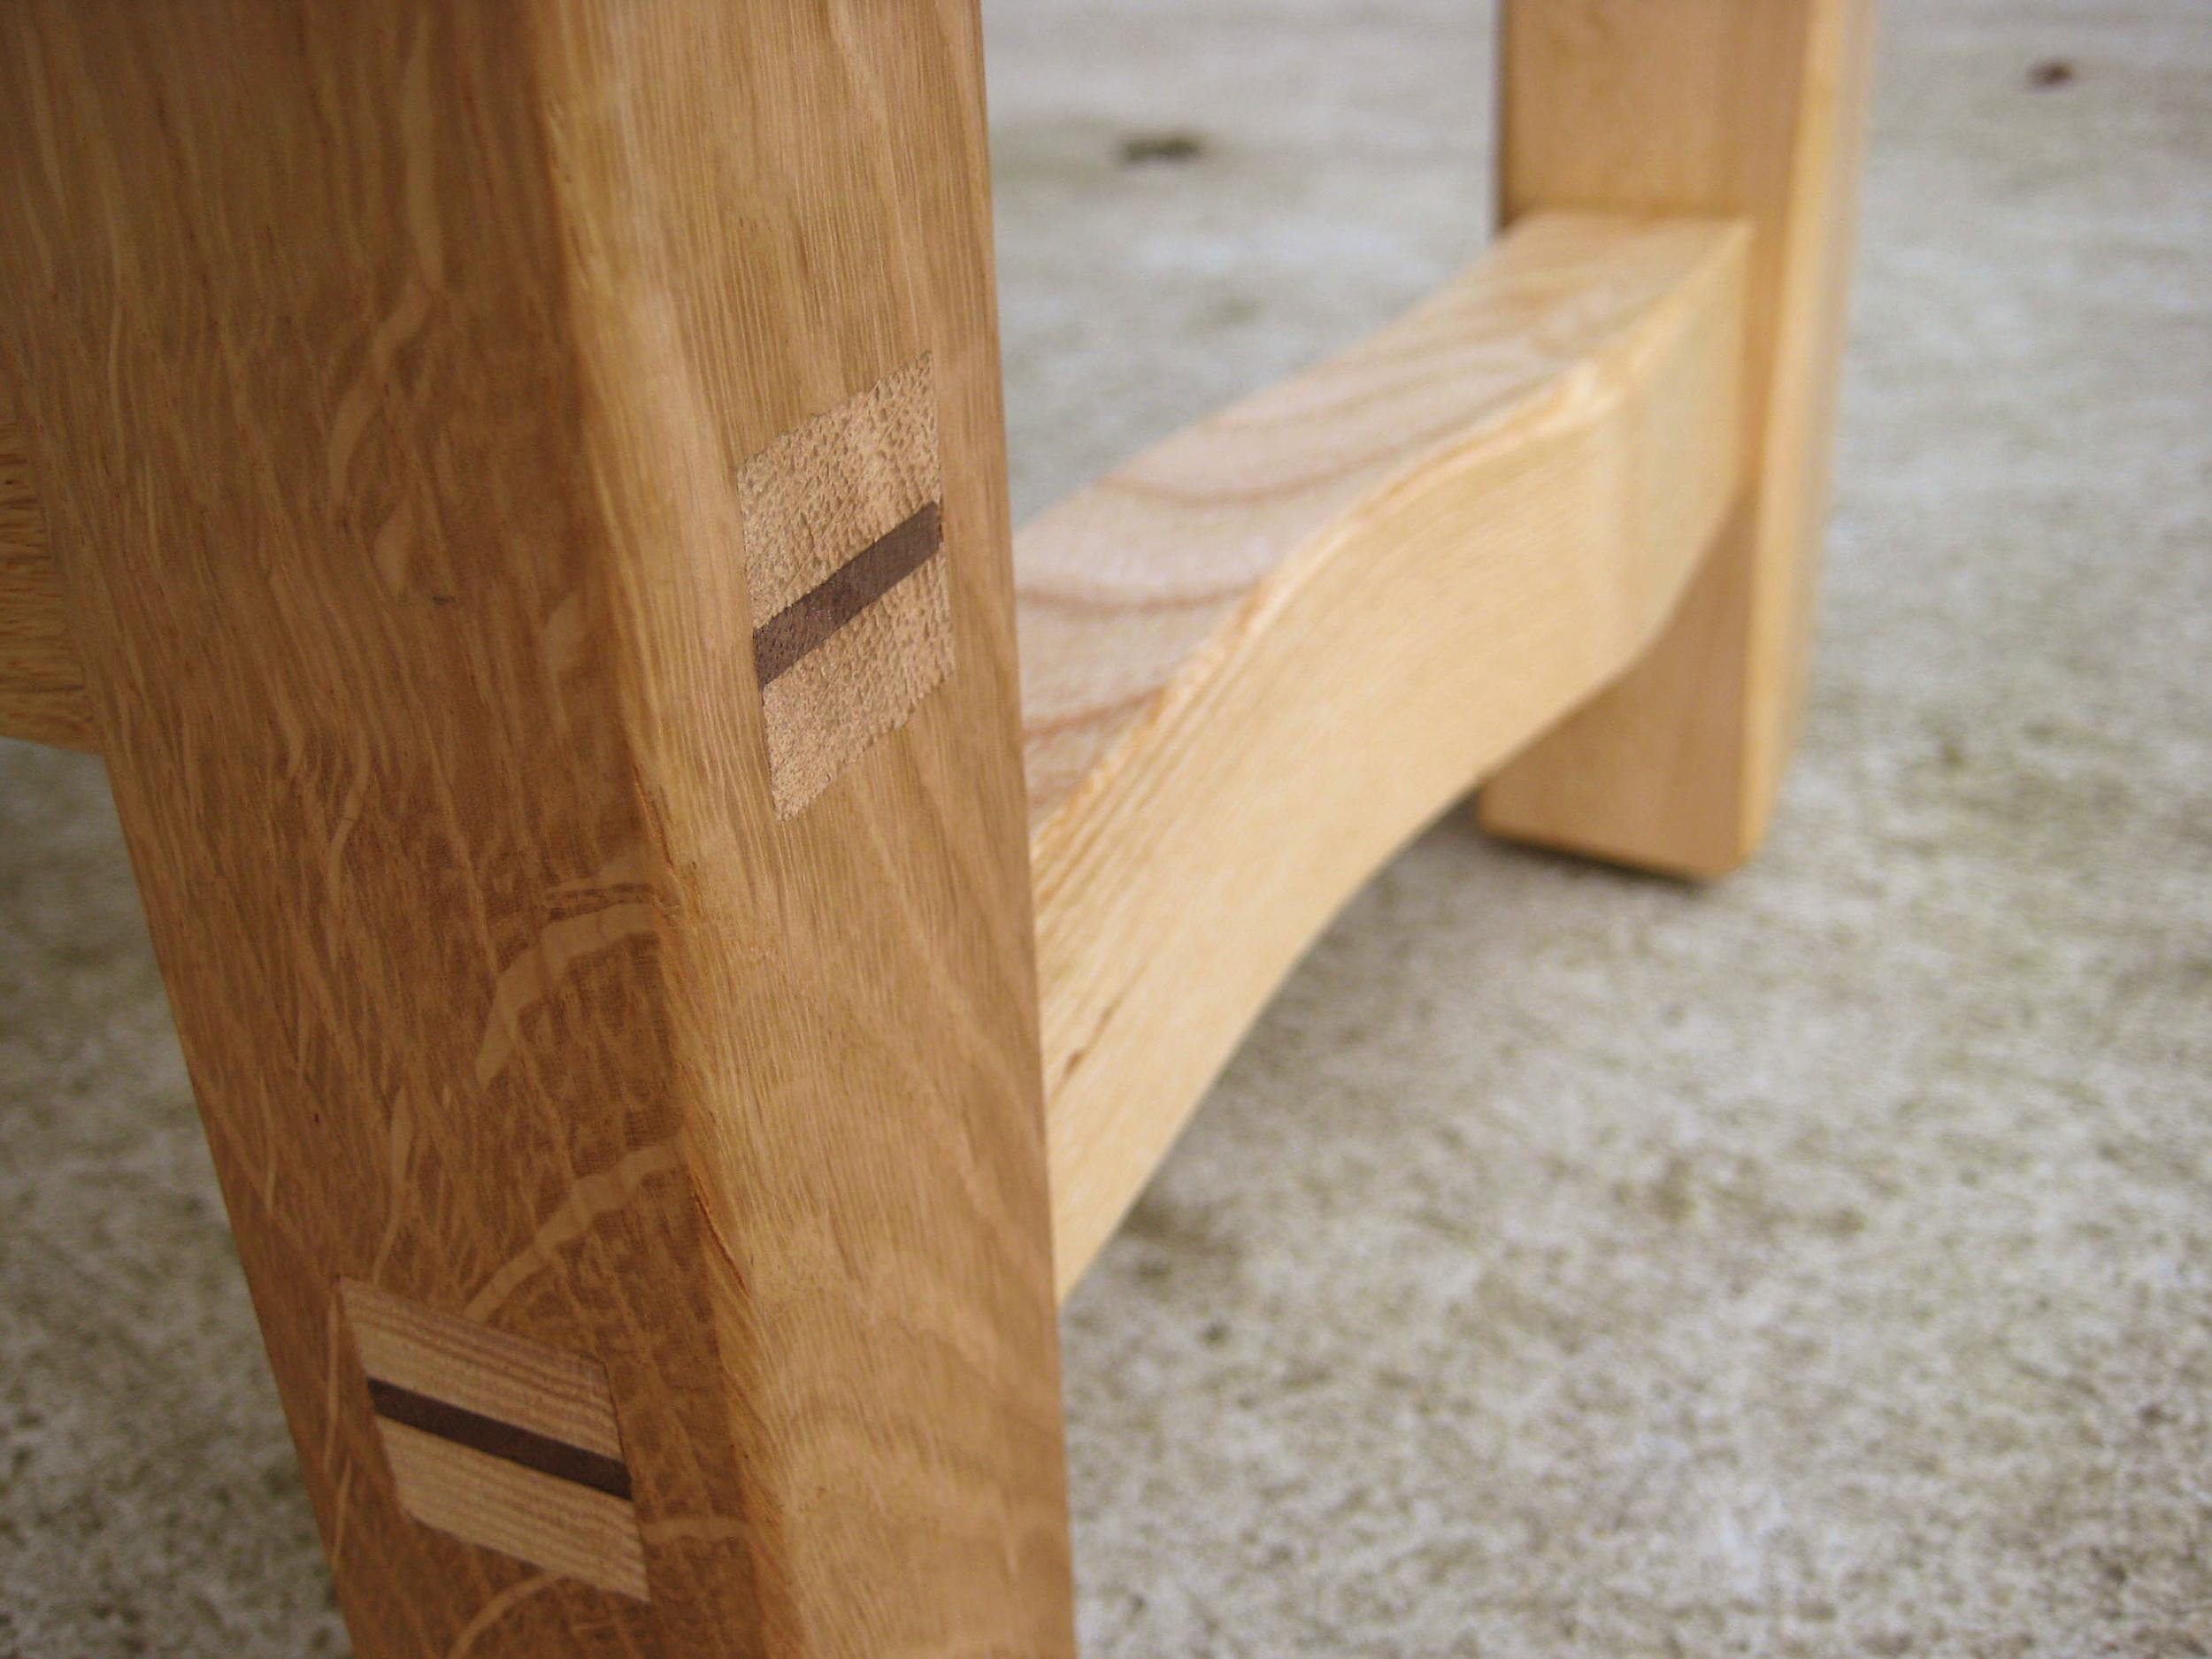 Hobbit hole chairs (2).JPG